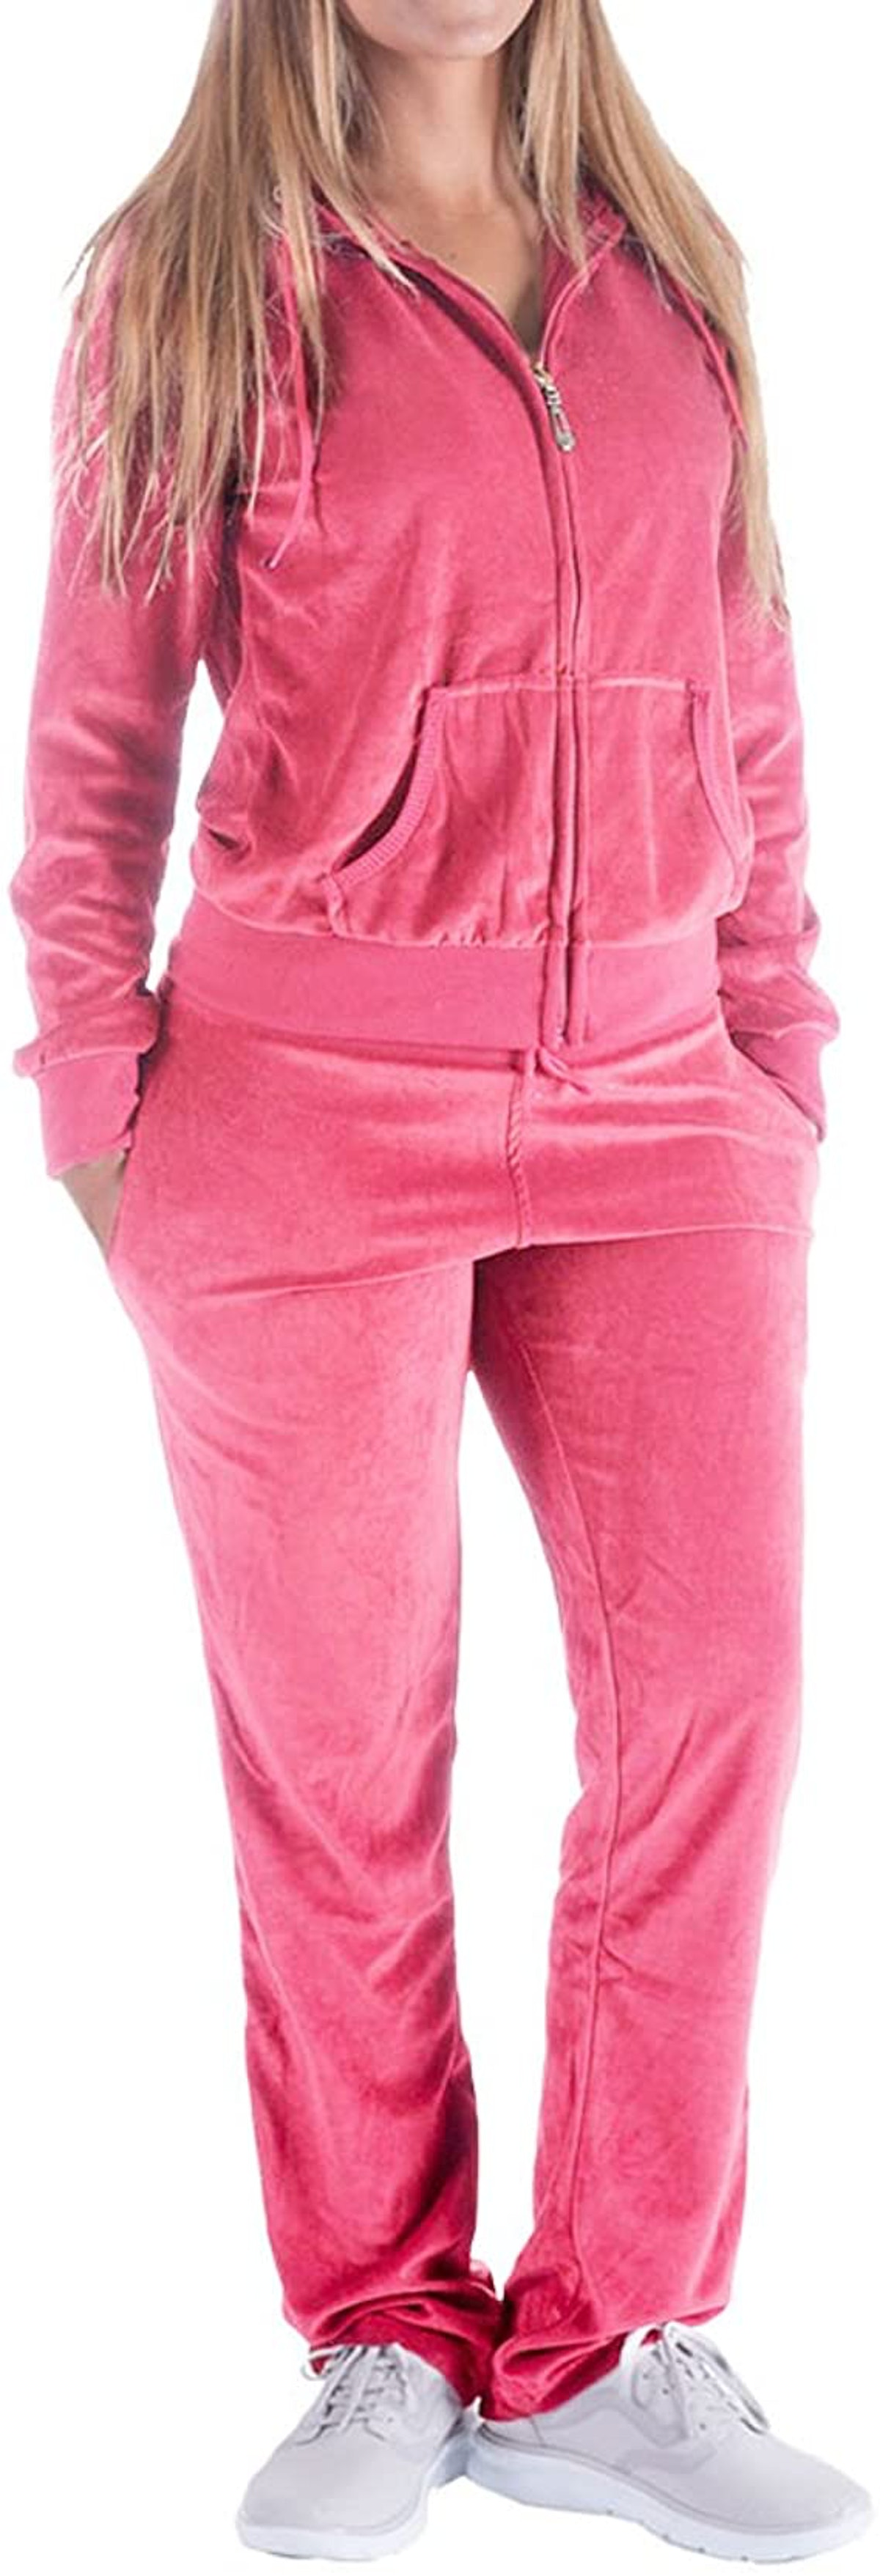 Facitisu Store Sweatsuits for Women Tracksuit 2 Piece Outfits Velour & Fleece Active Wear